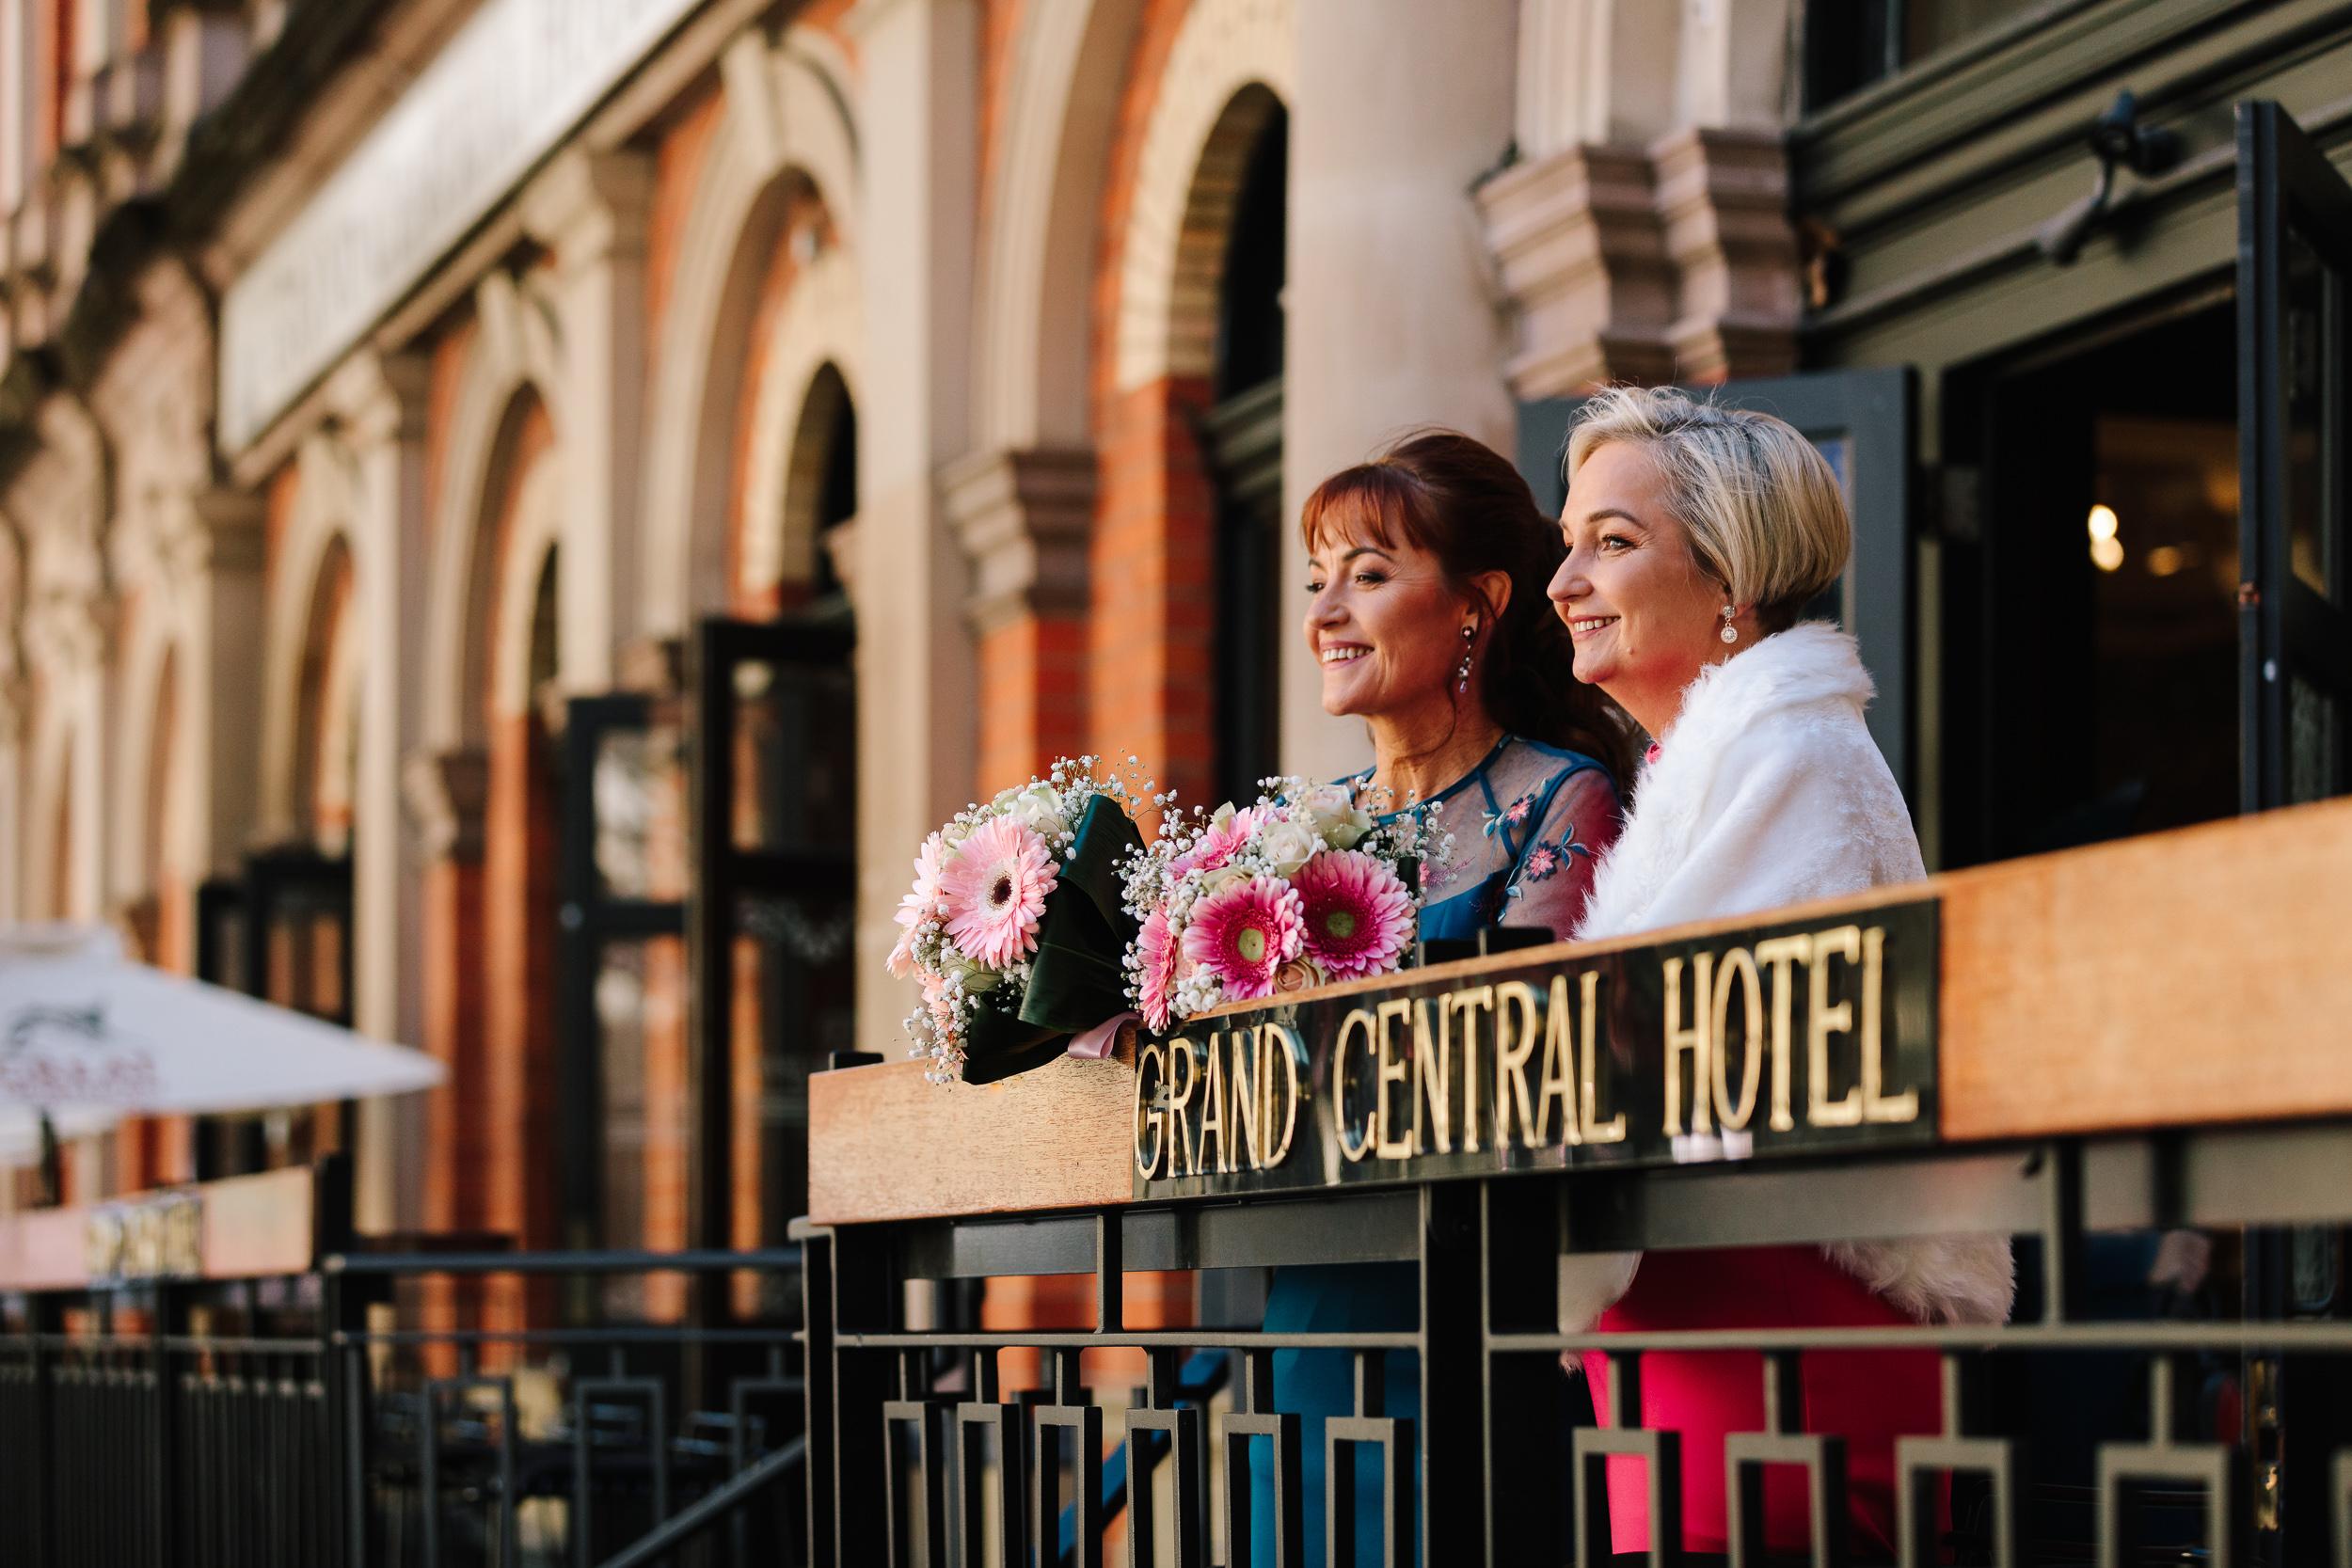 Grand Central Hotel Ann Street Near Anzac Square. Photo by Chris Jack.